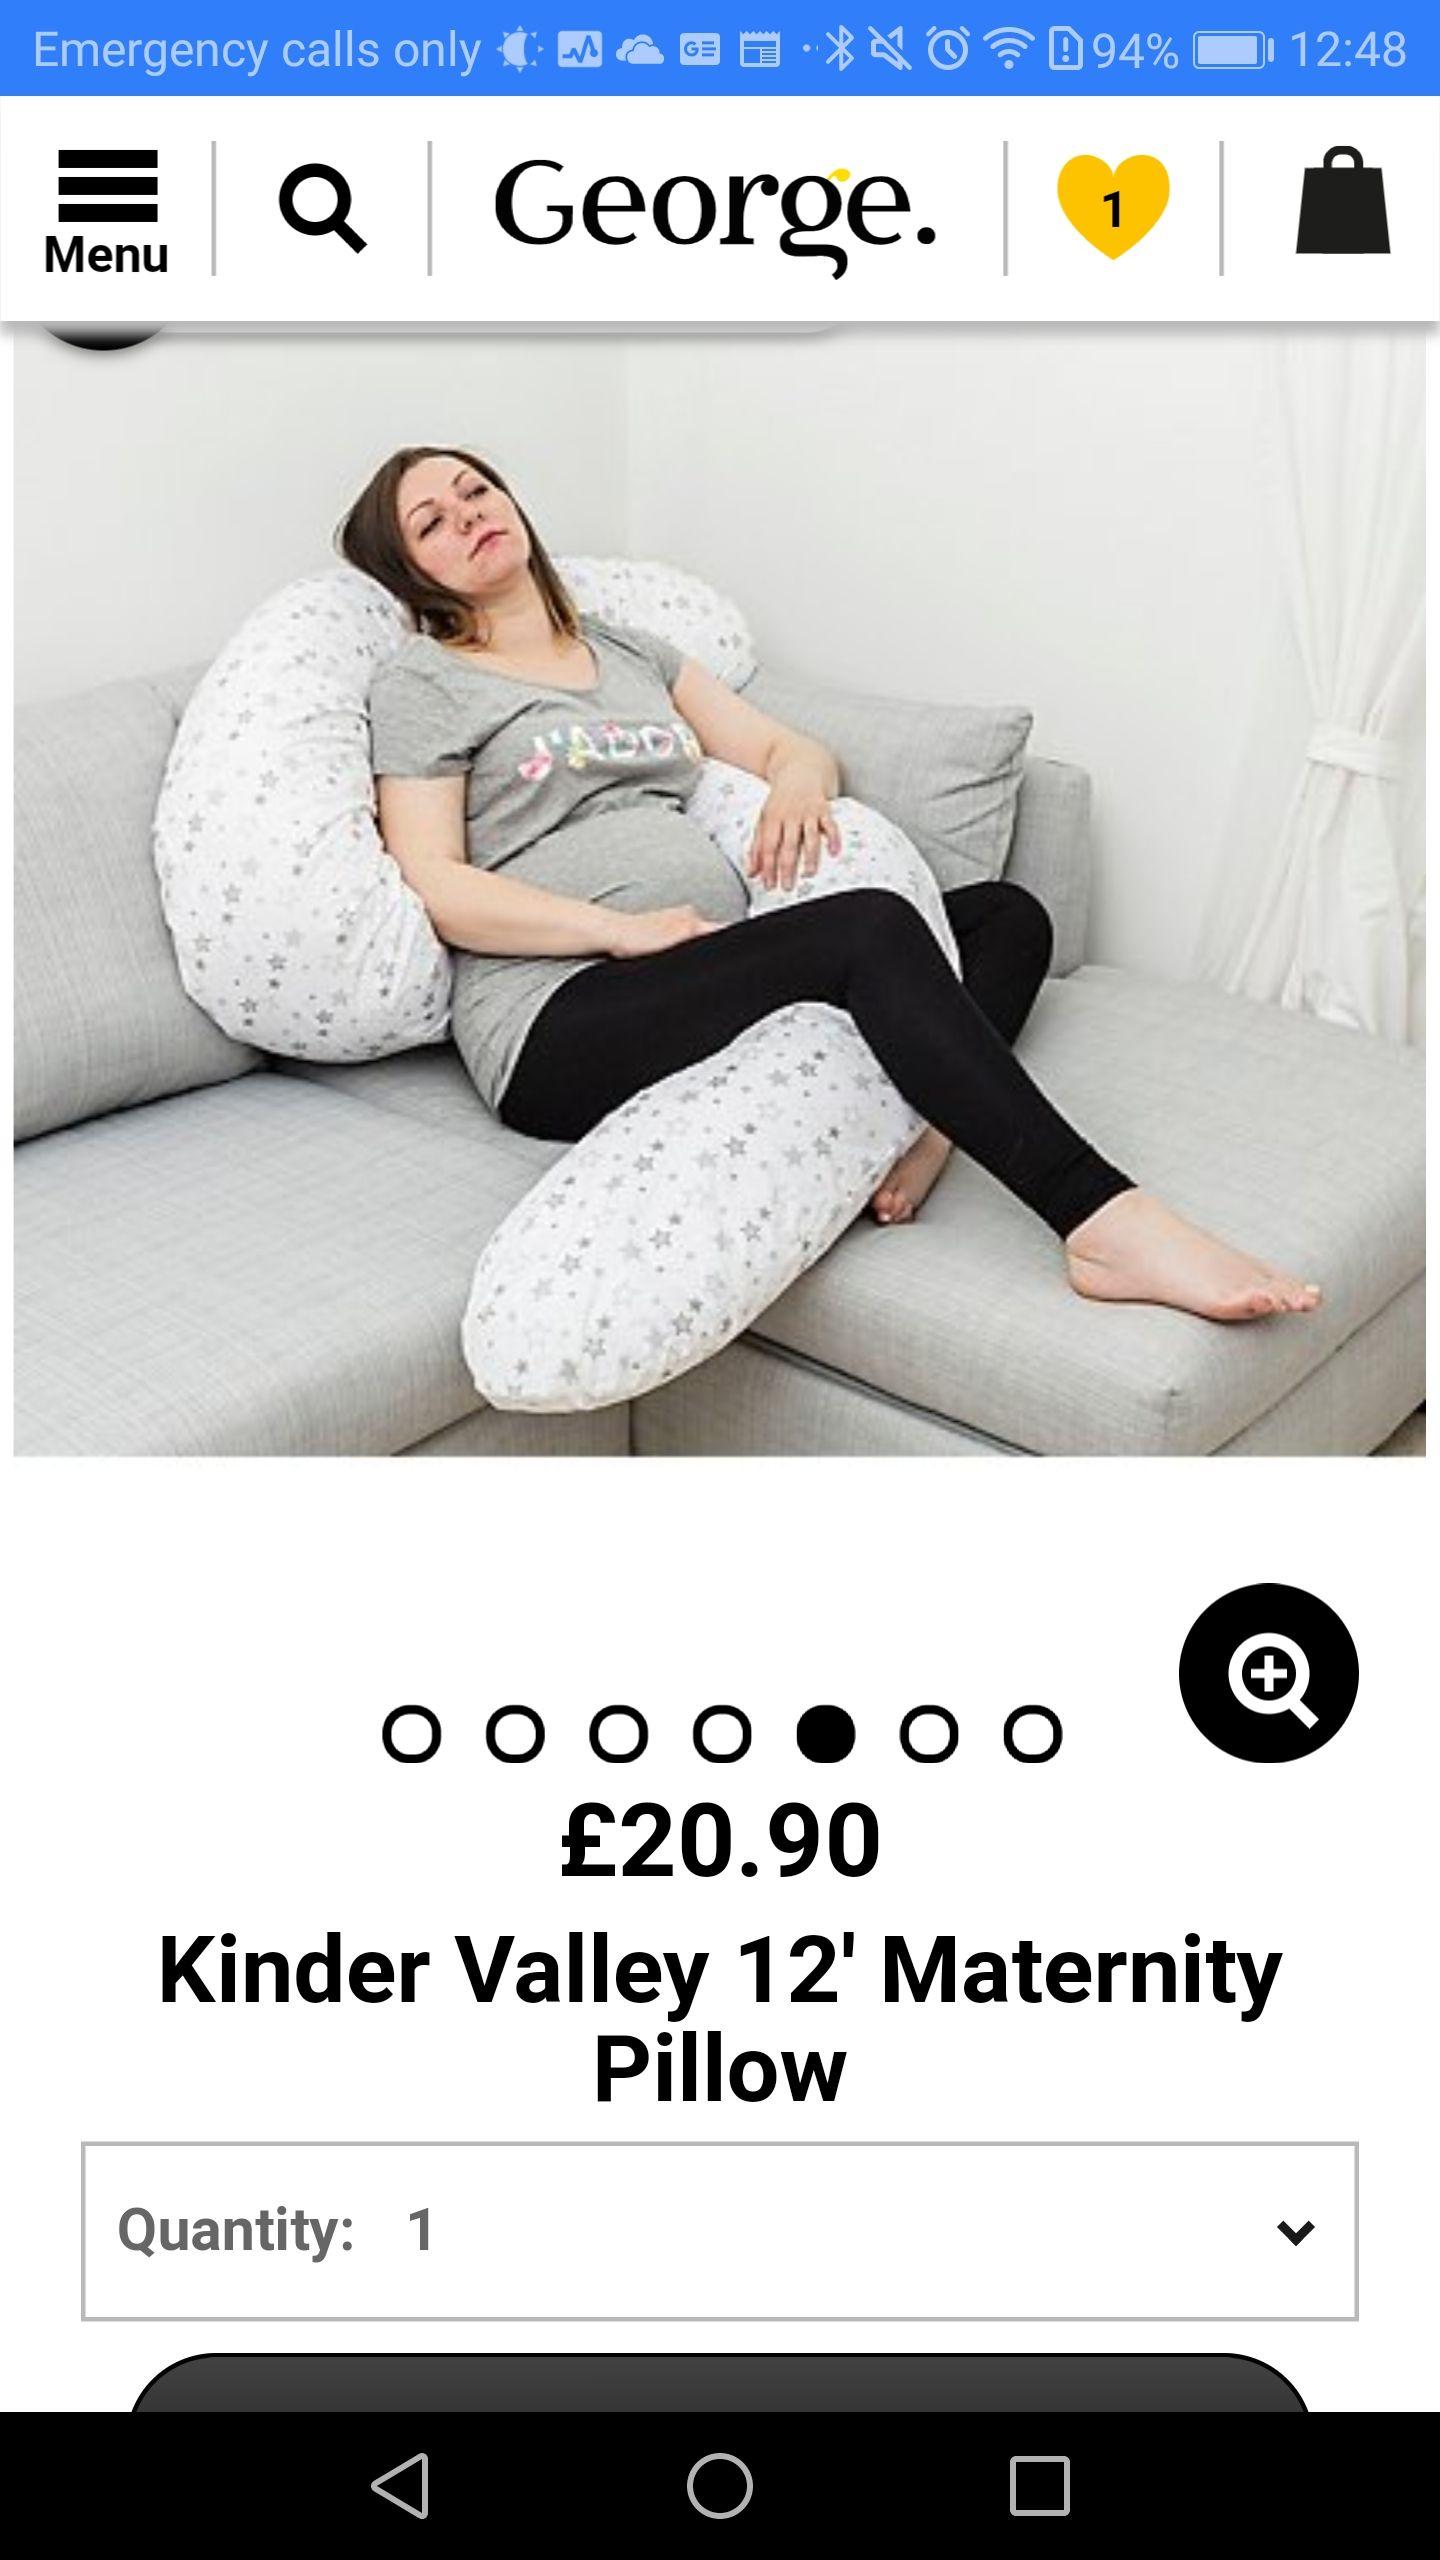 3.65 metres pregnancy pillow £20.90 Asda George